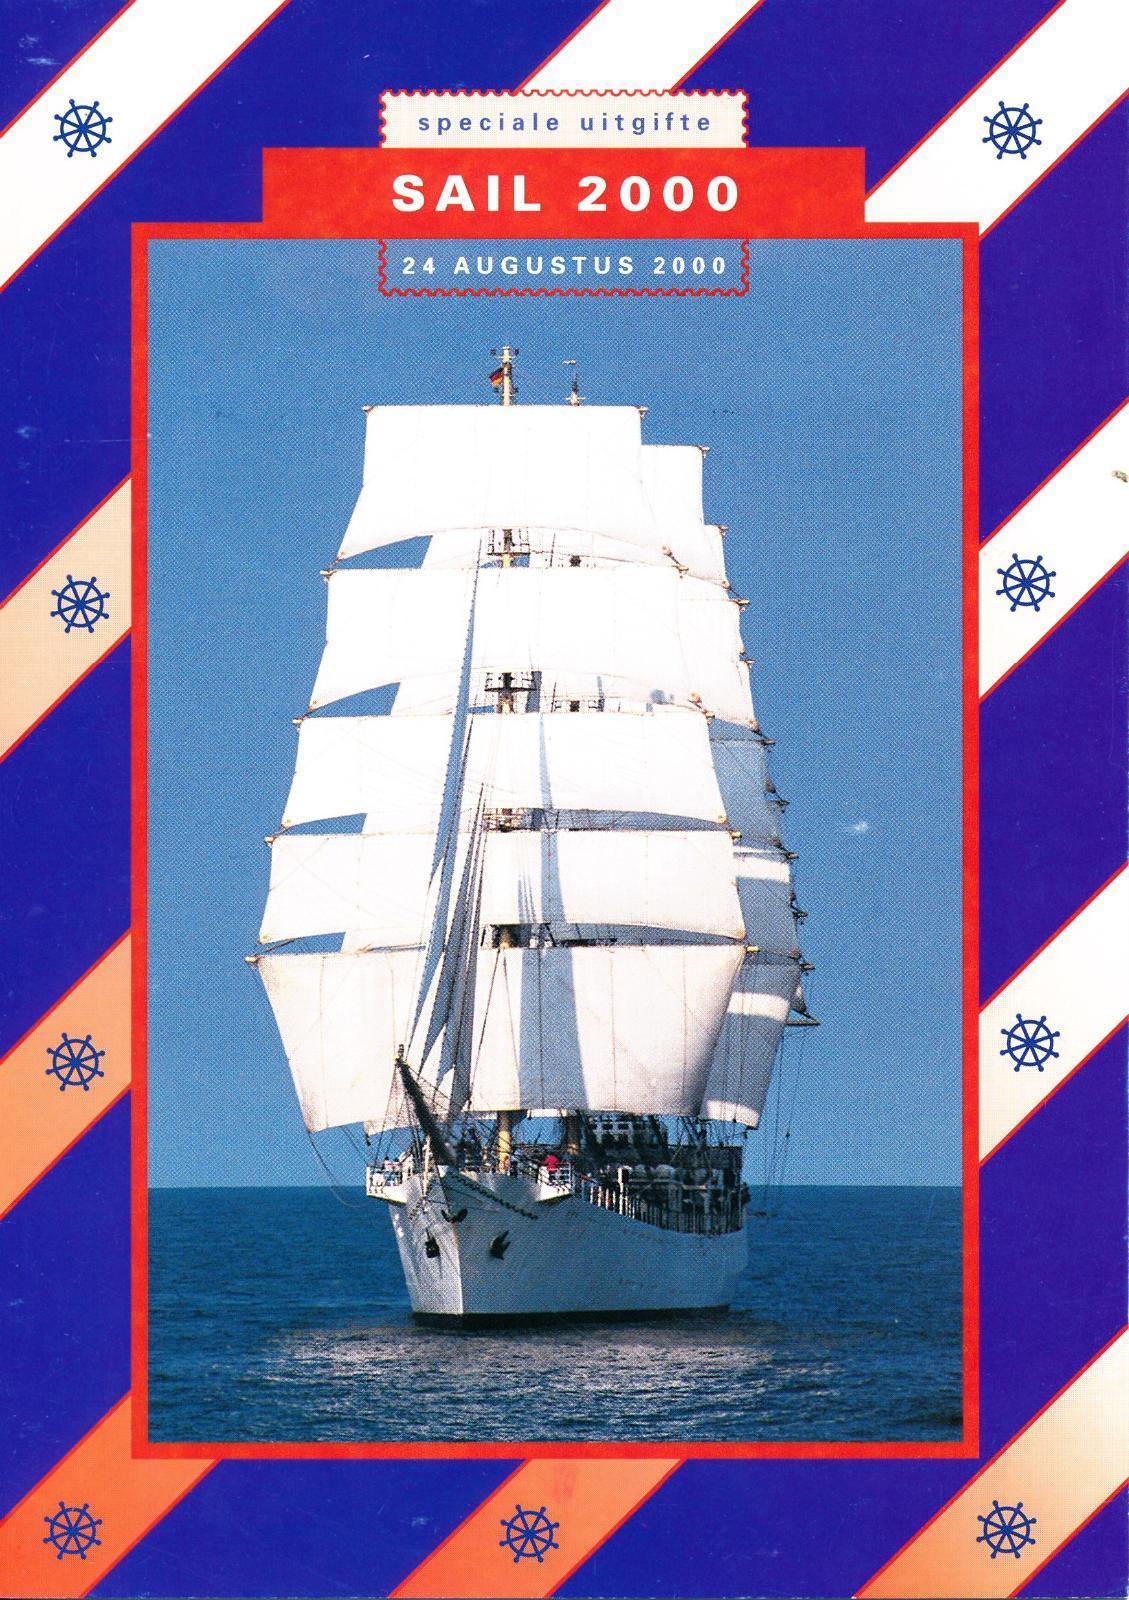 Nederland 2000 Themamapje Sail 2000